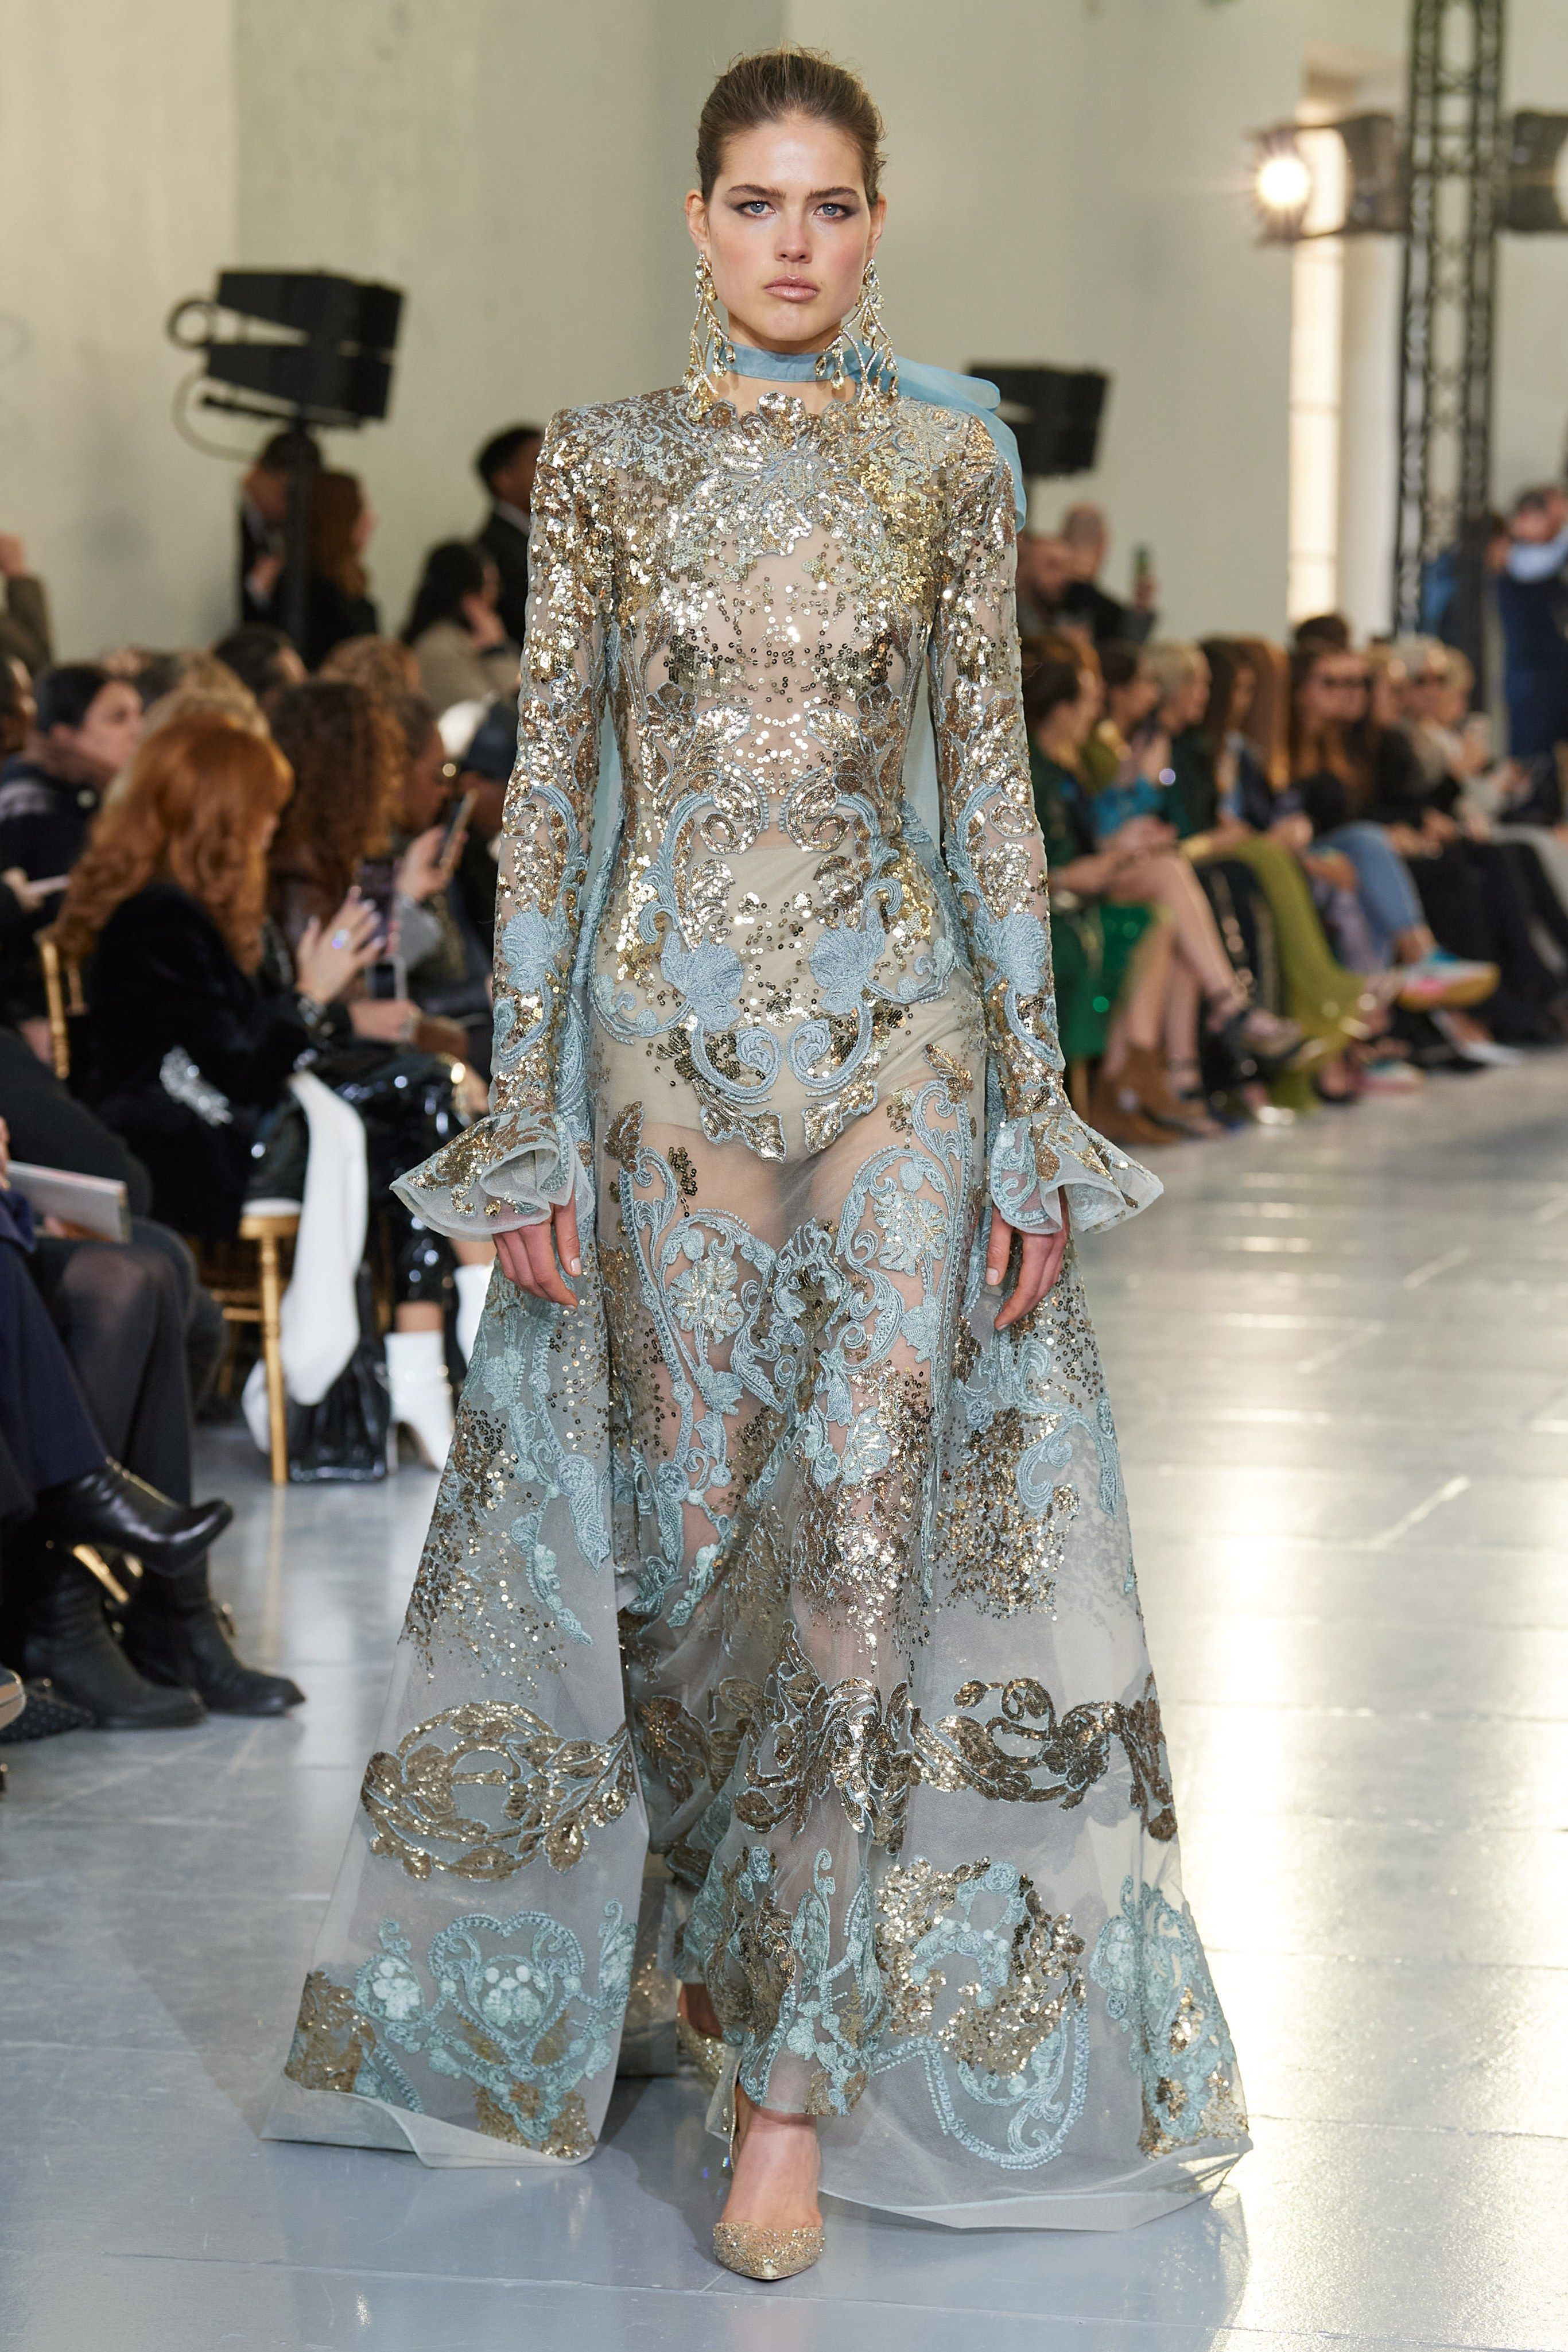 Elie Saab Spring 2020 Couture Collection Vogue Elie Saab Couture Couture Gowns Couture Fashion